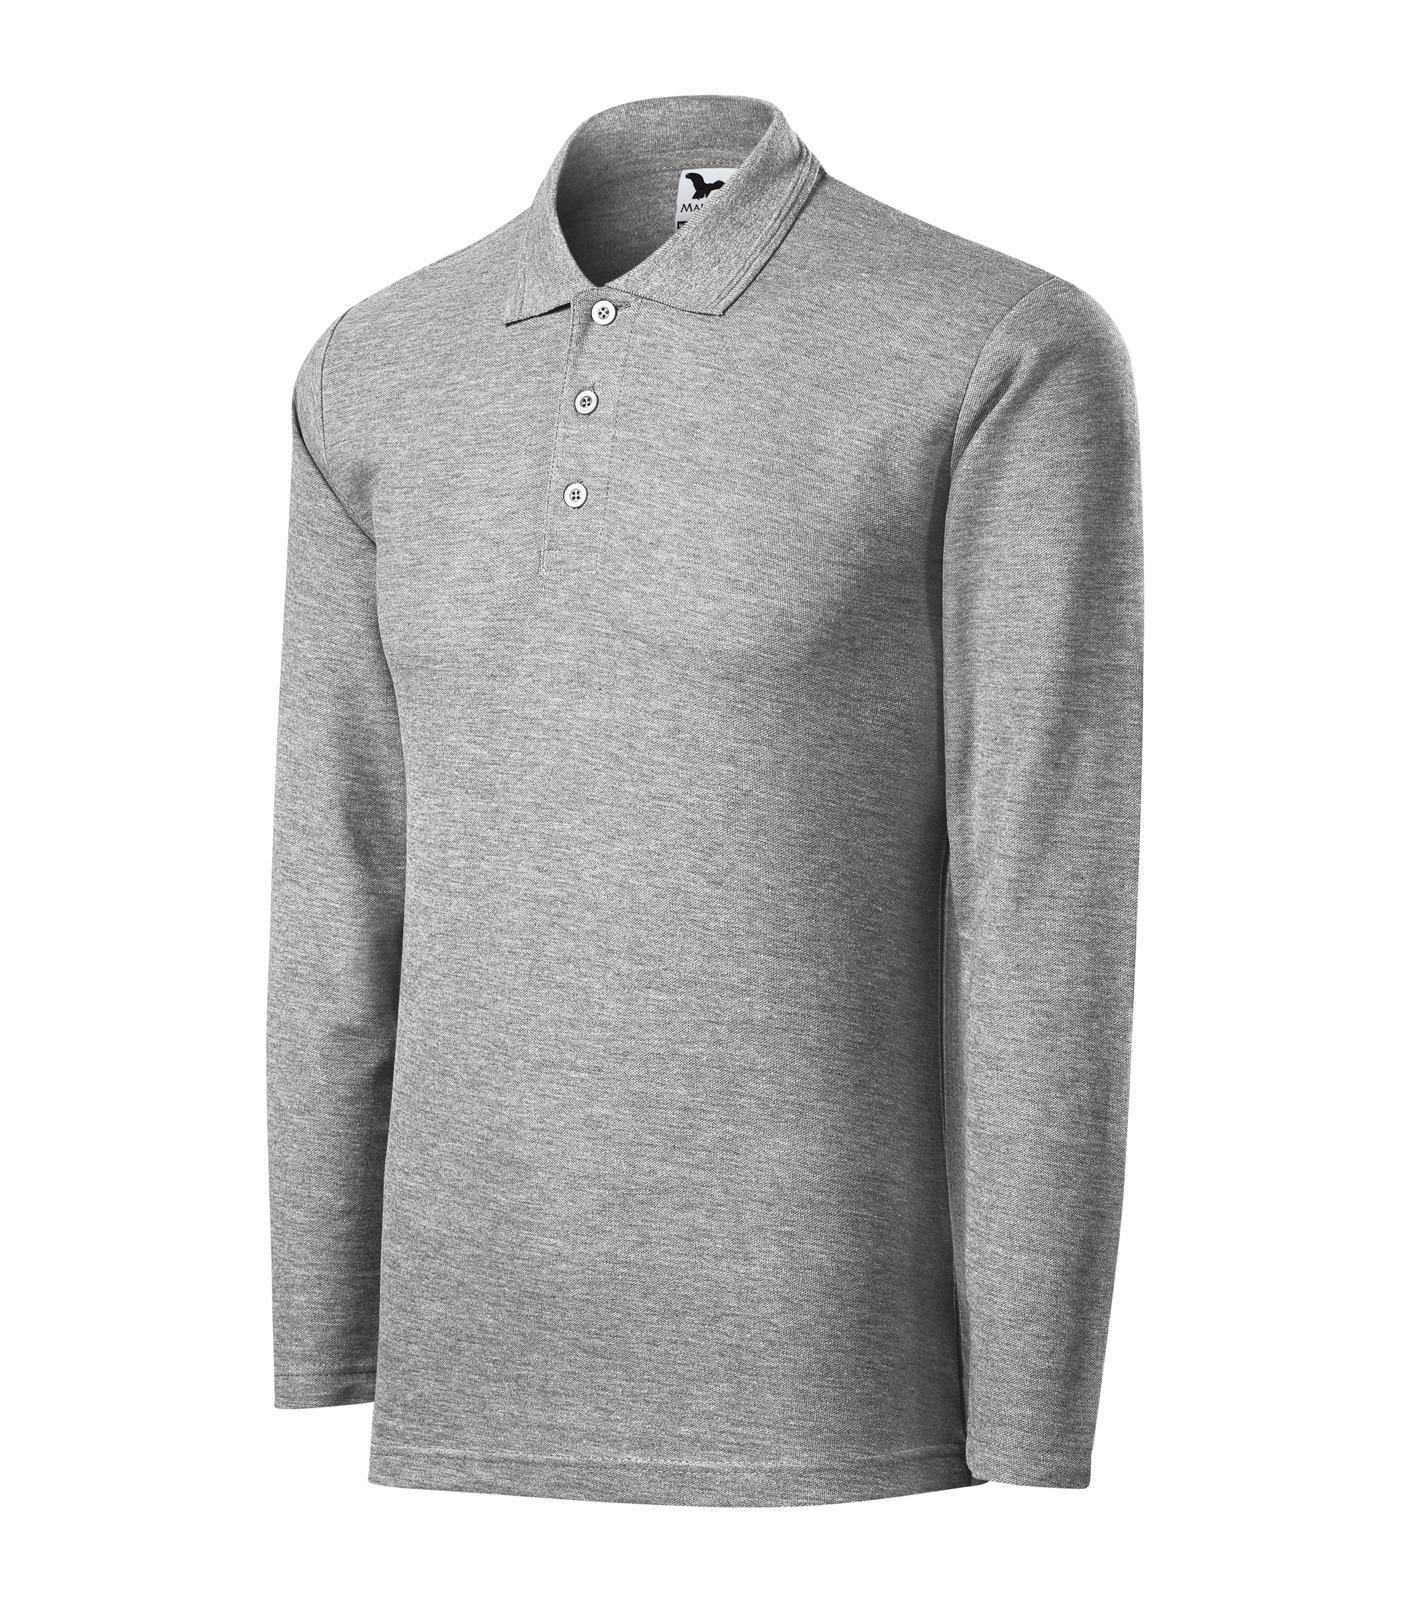 Polo Shirt men's Malfini Pique Polo LS - Dark Gray Melange / XL